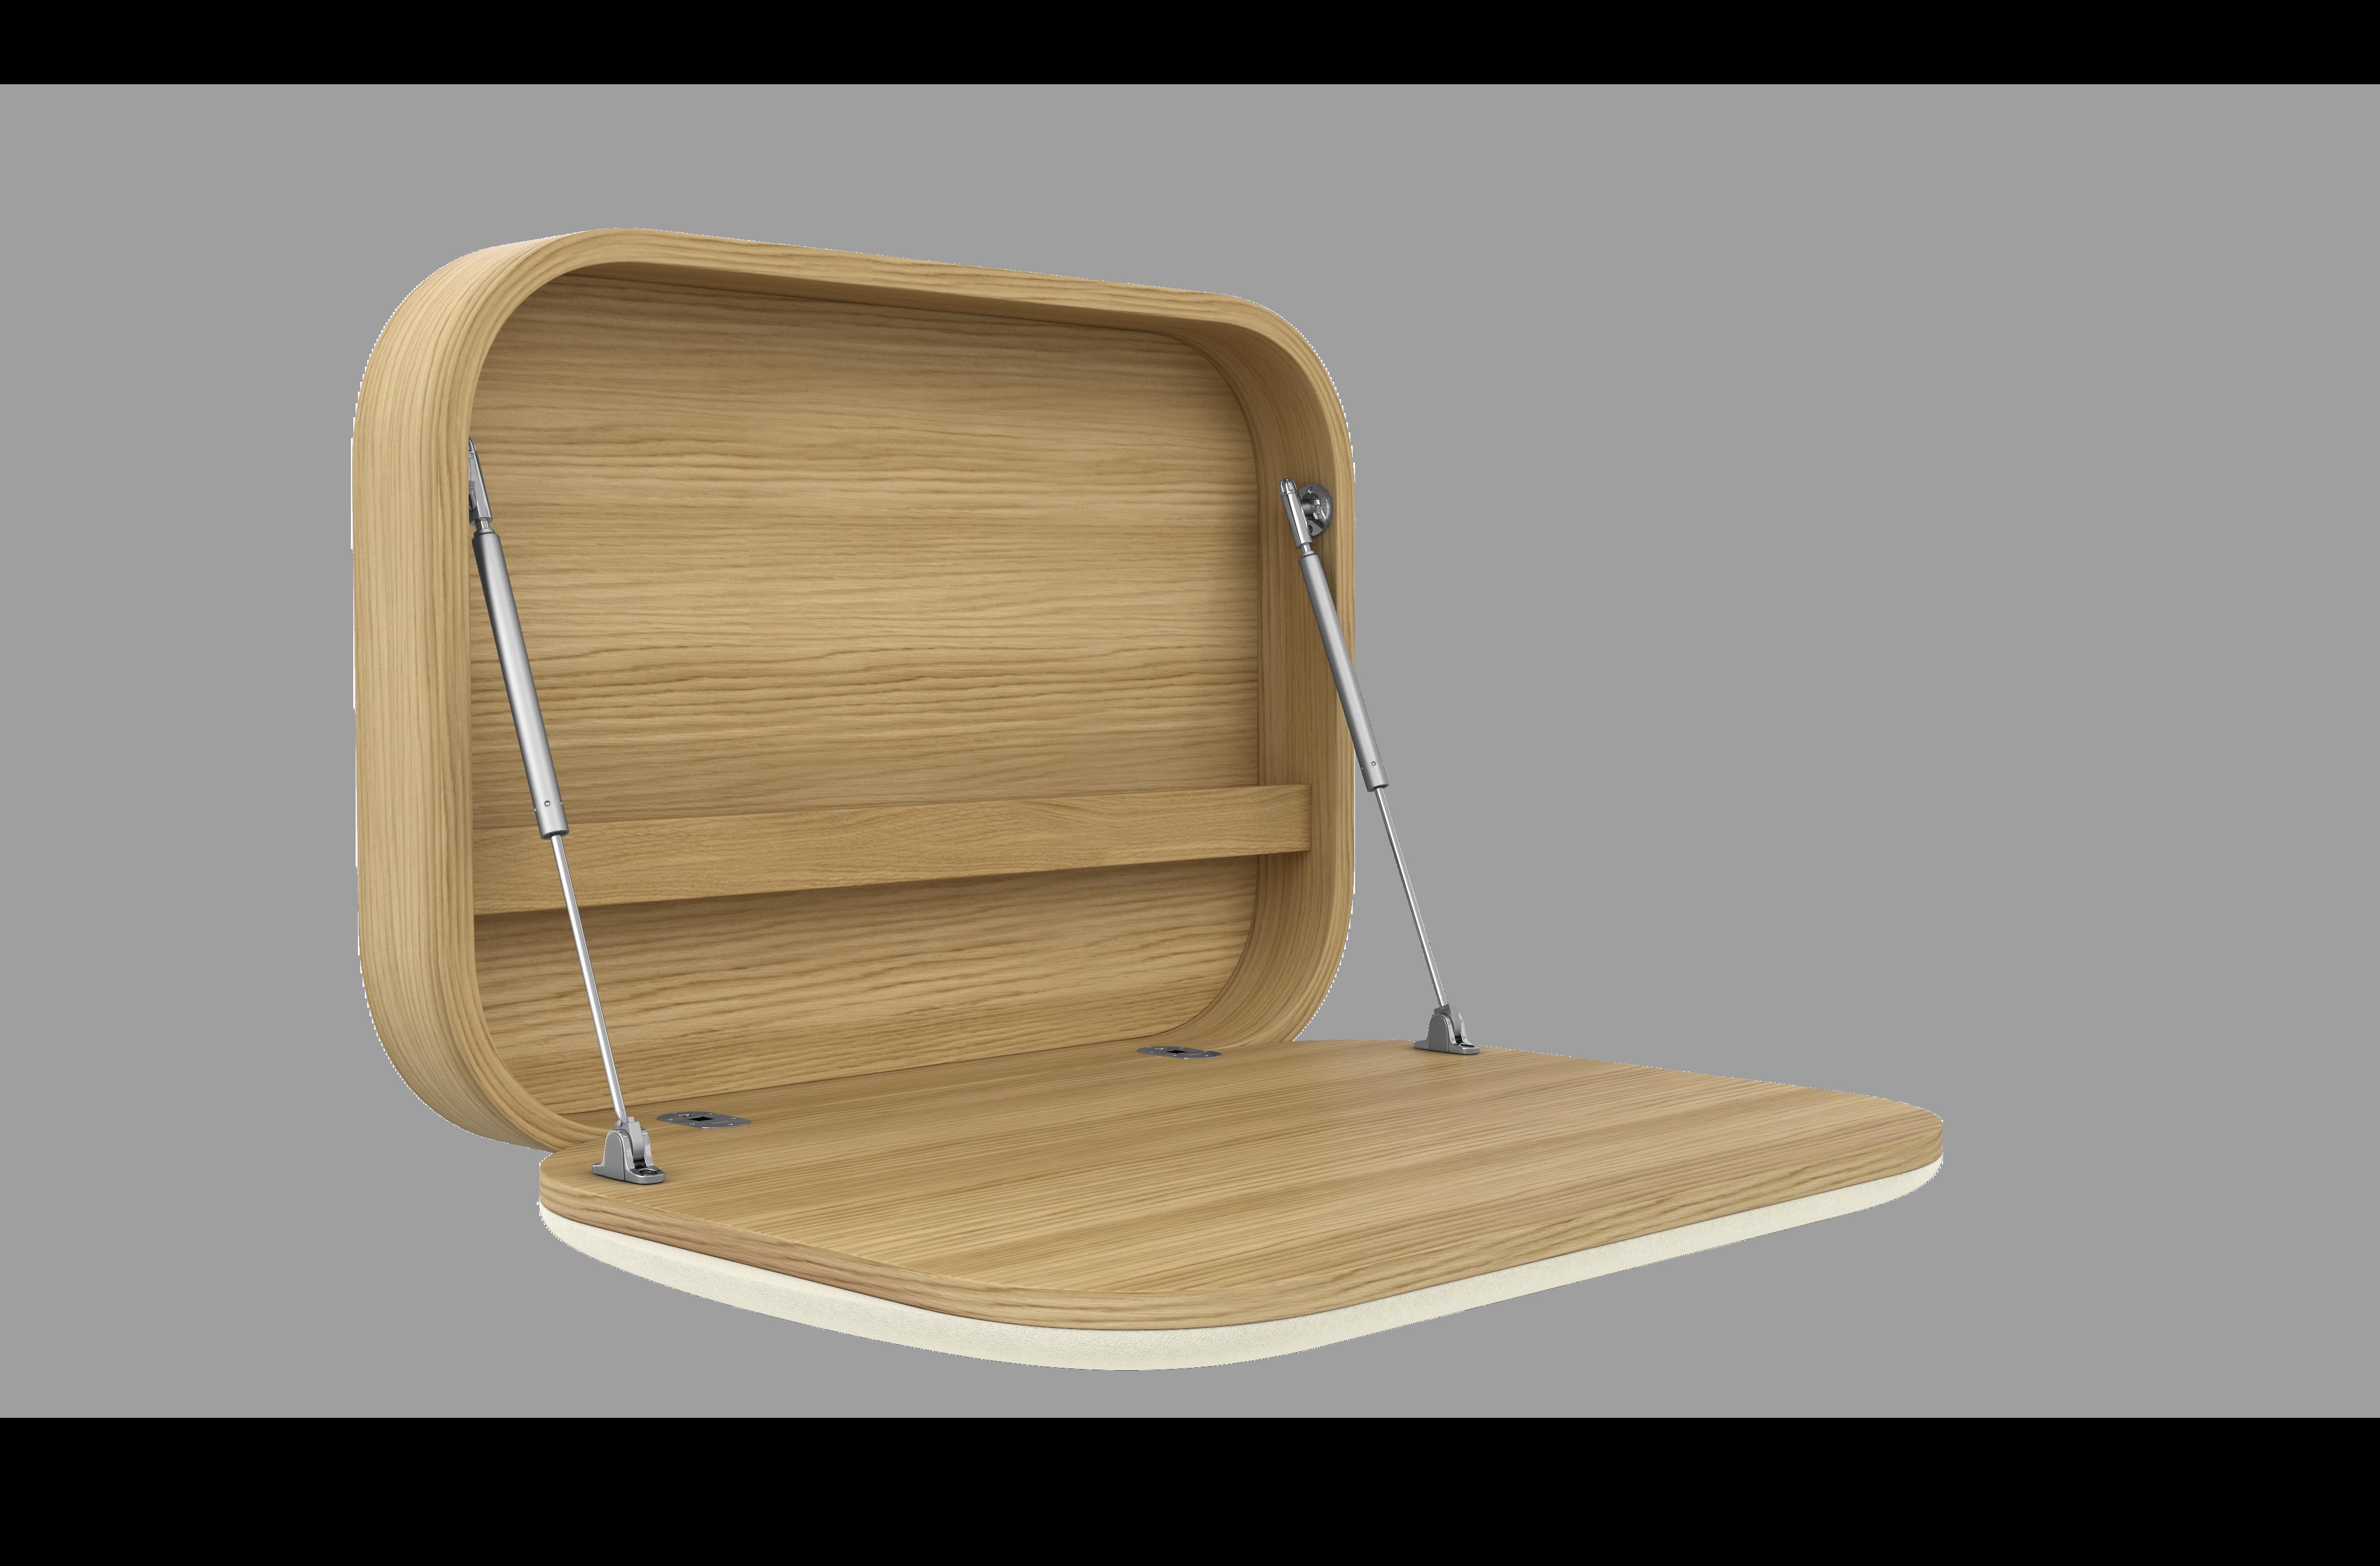 NUBO Desks Secretary Designer GamFratesi